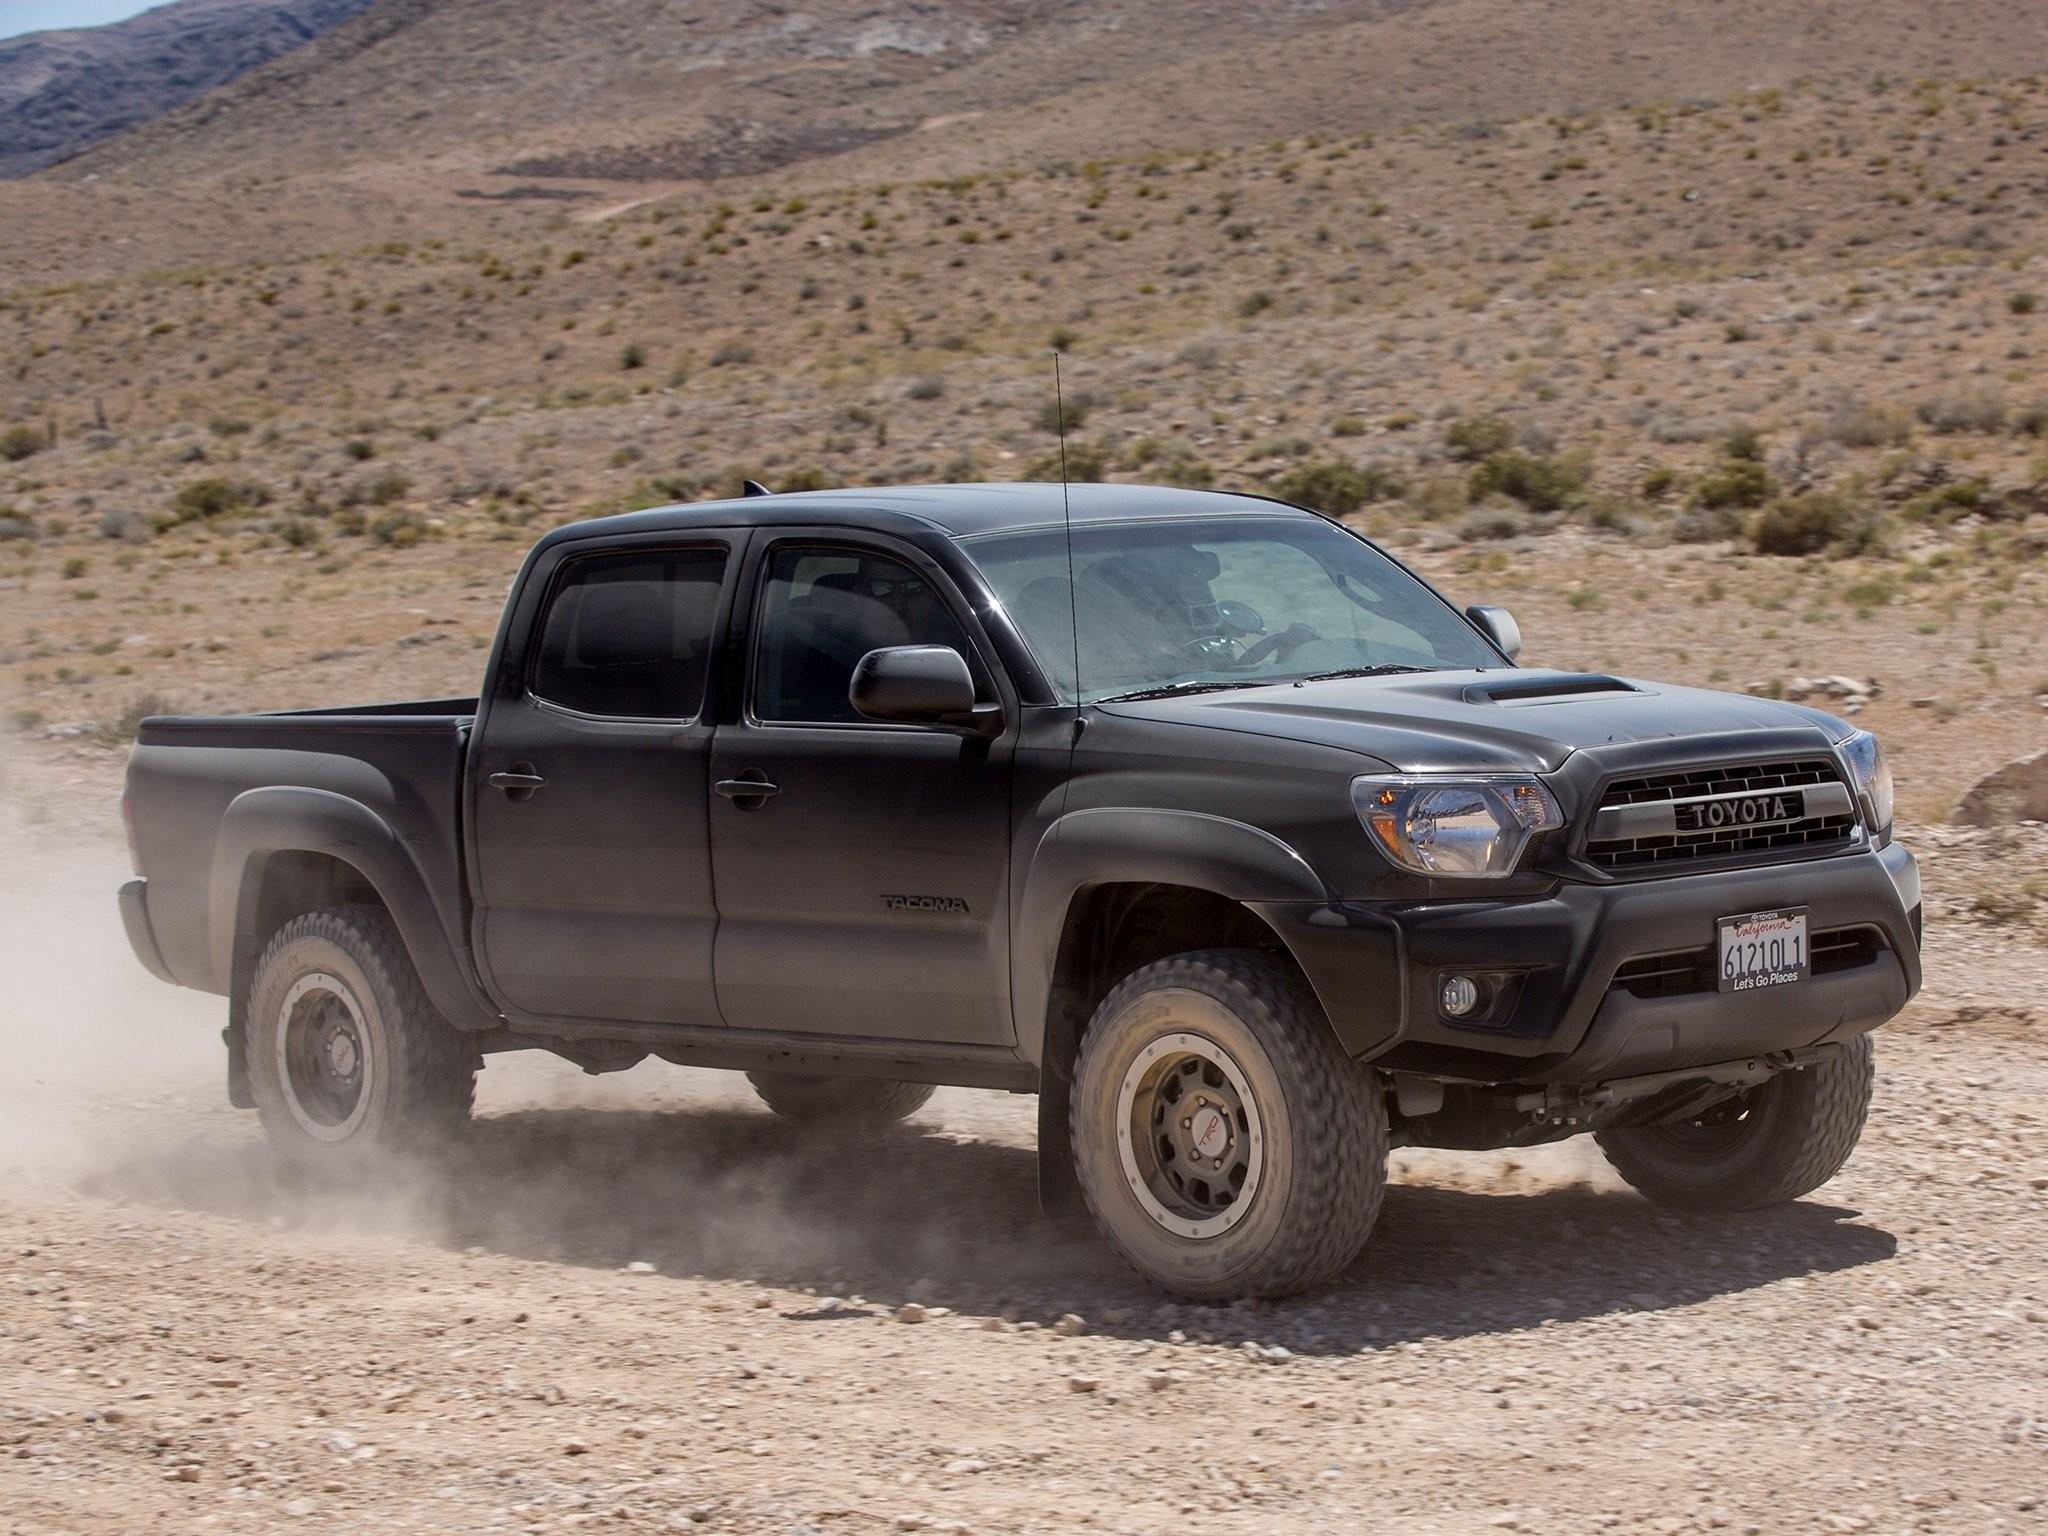 2015 Toyota Tacoma TRD Pro pickup ew wallpaper | | 351036 |  WallpaperUP